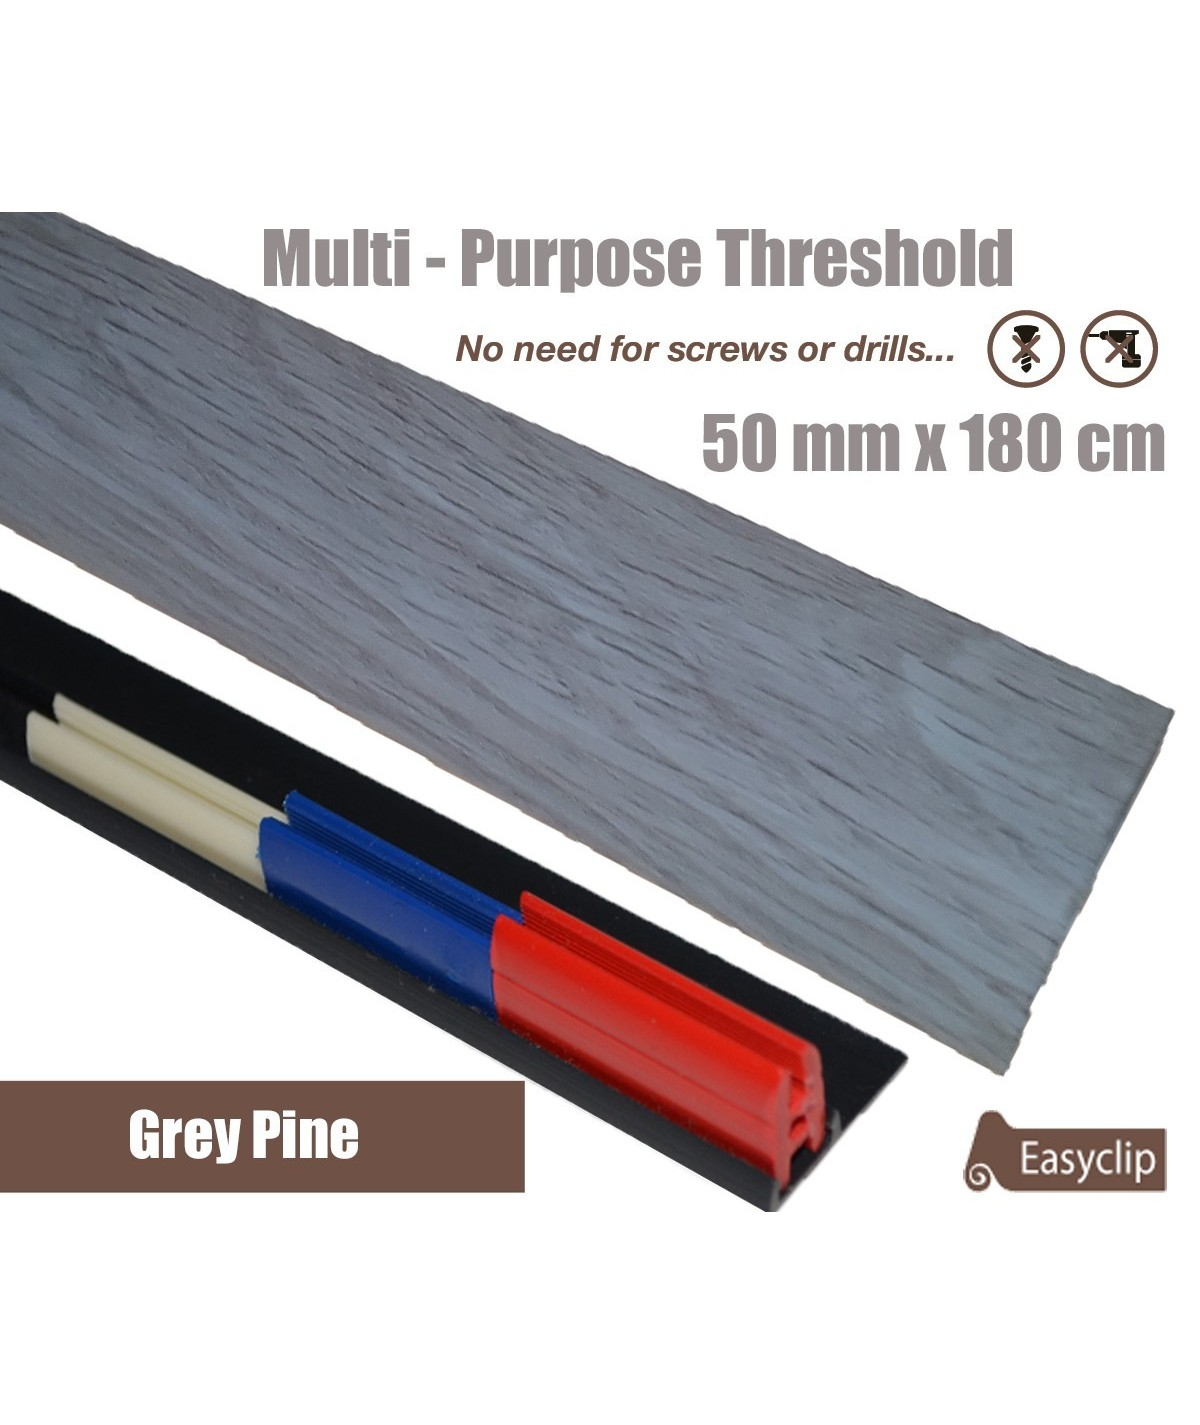 Grey Pine Laminated Transition Threshold Strip  50mm x180cm Multi-Height/Pivots